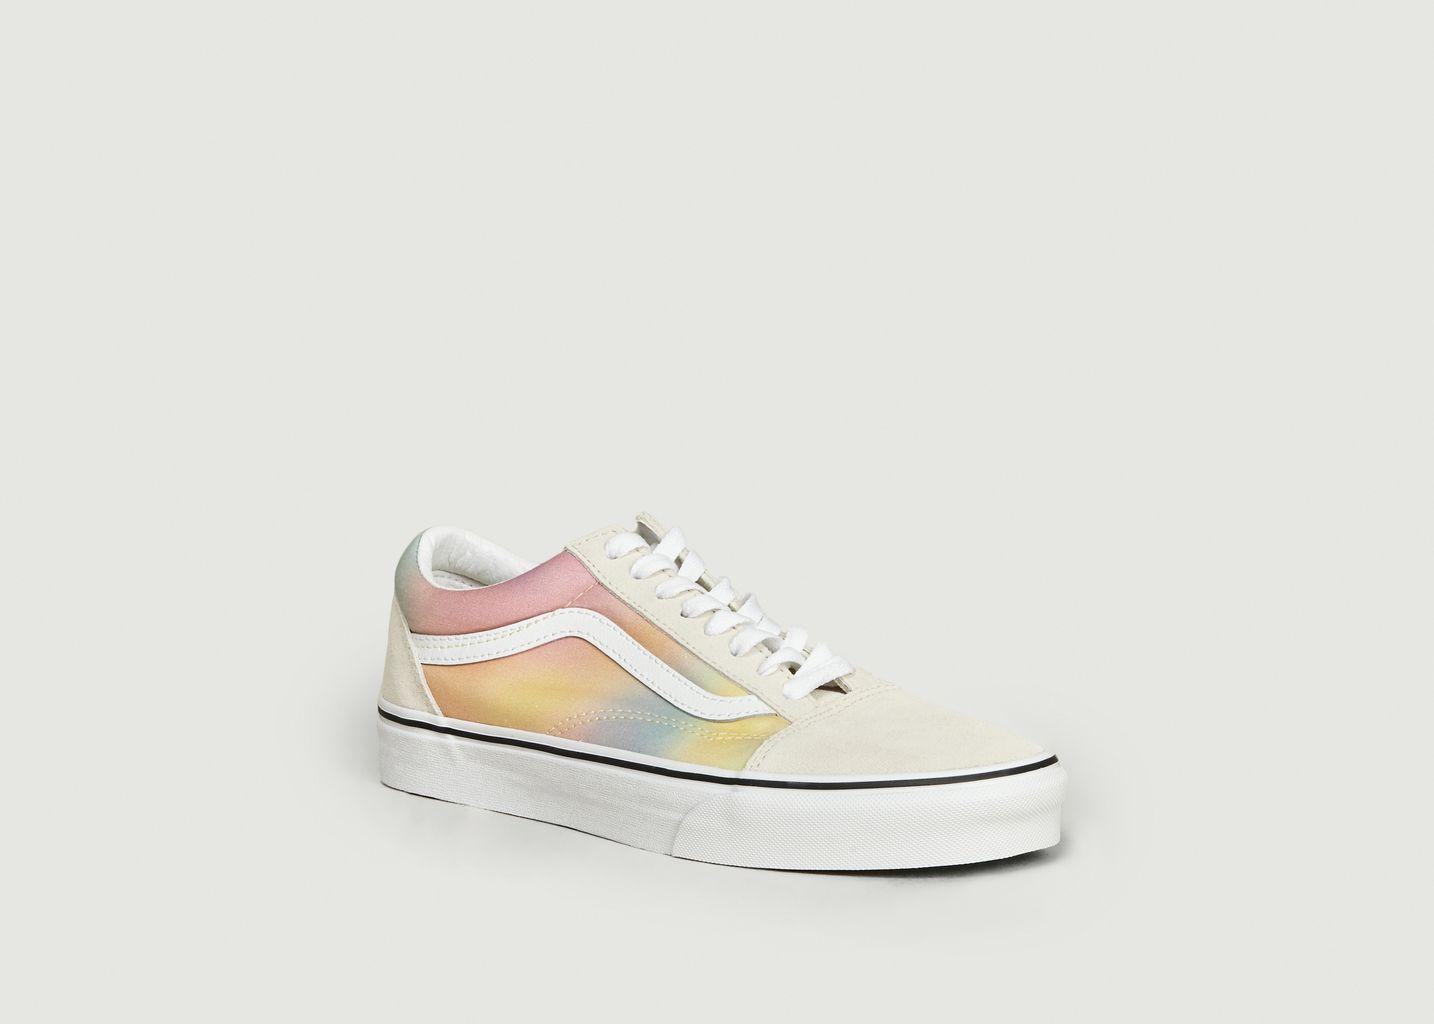 Vans Women's Old Skool Aura Shoes Multicolor